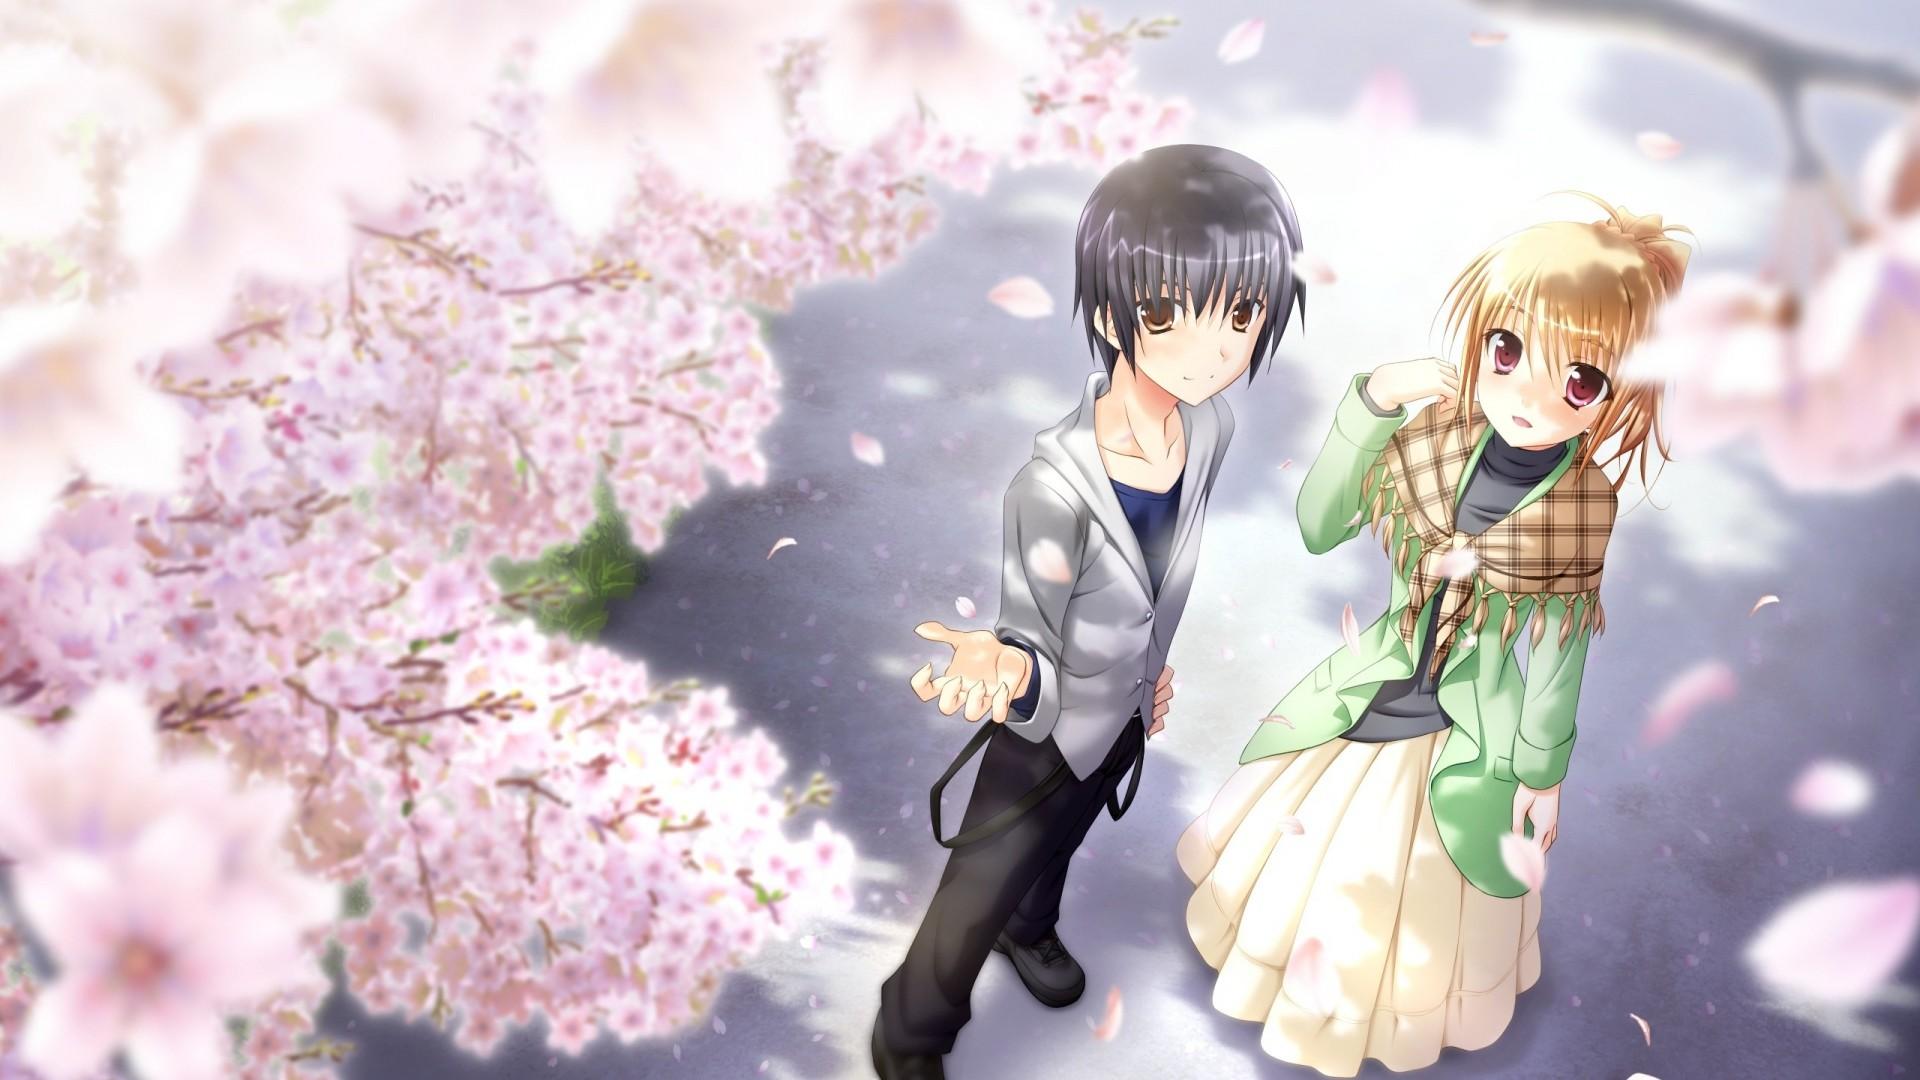 Wallpaper konata yori kanata made, francesca bathory, girl, boy,  couple, · Cute Anime …